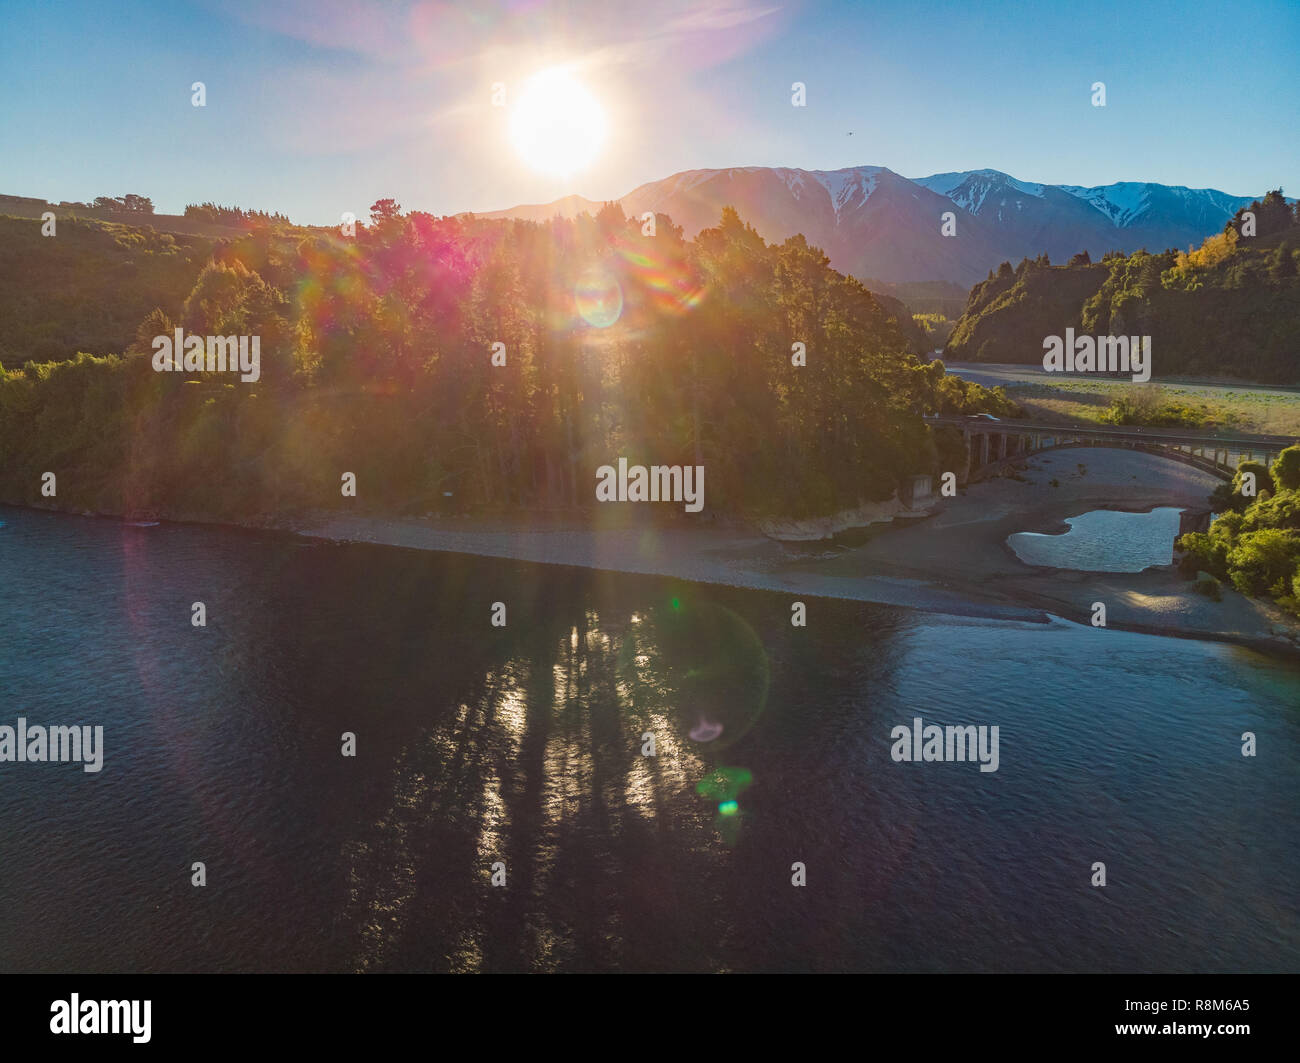 Bridges over Rakaia river, Rakaia Gorge, New Zealand, South Island, during sunset Stock Photo